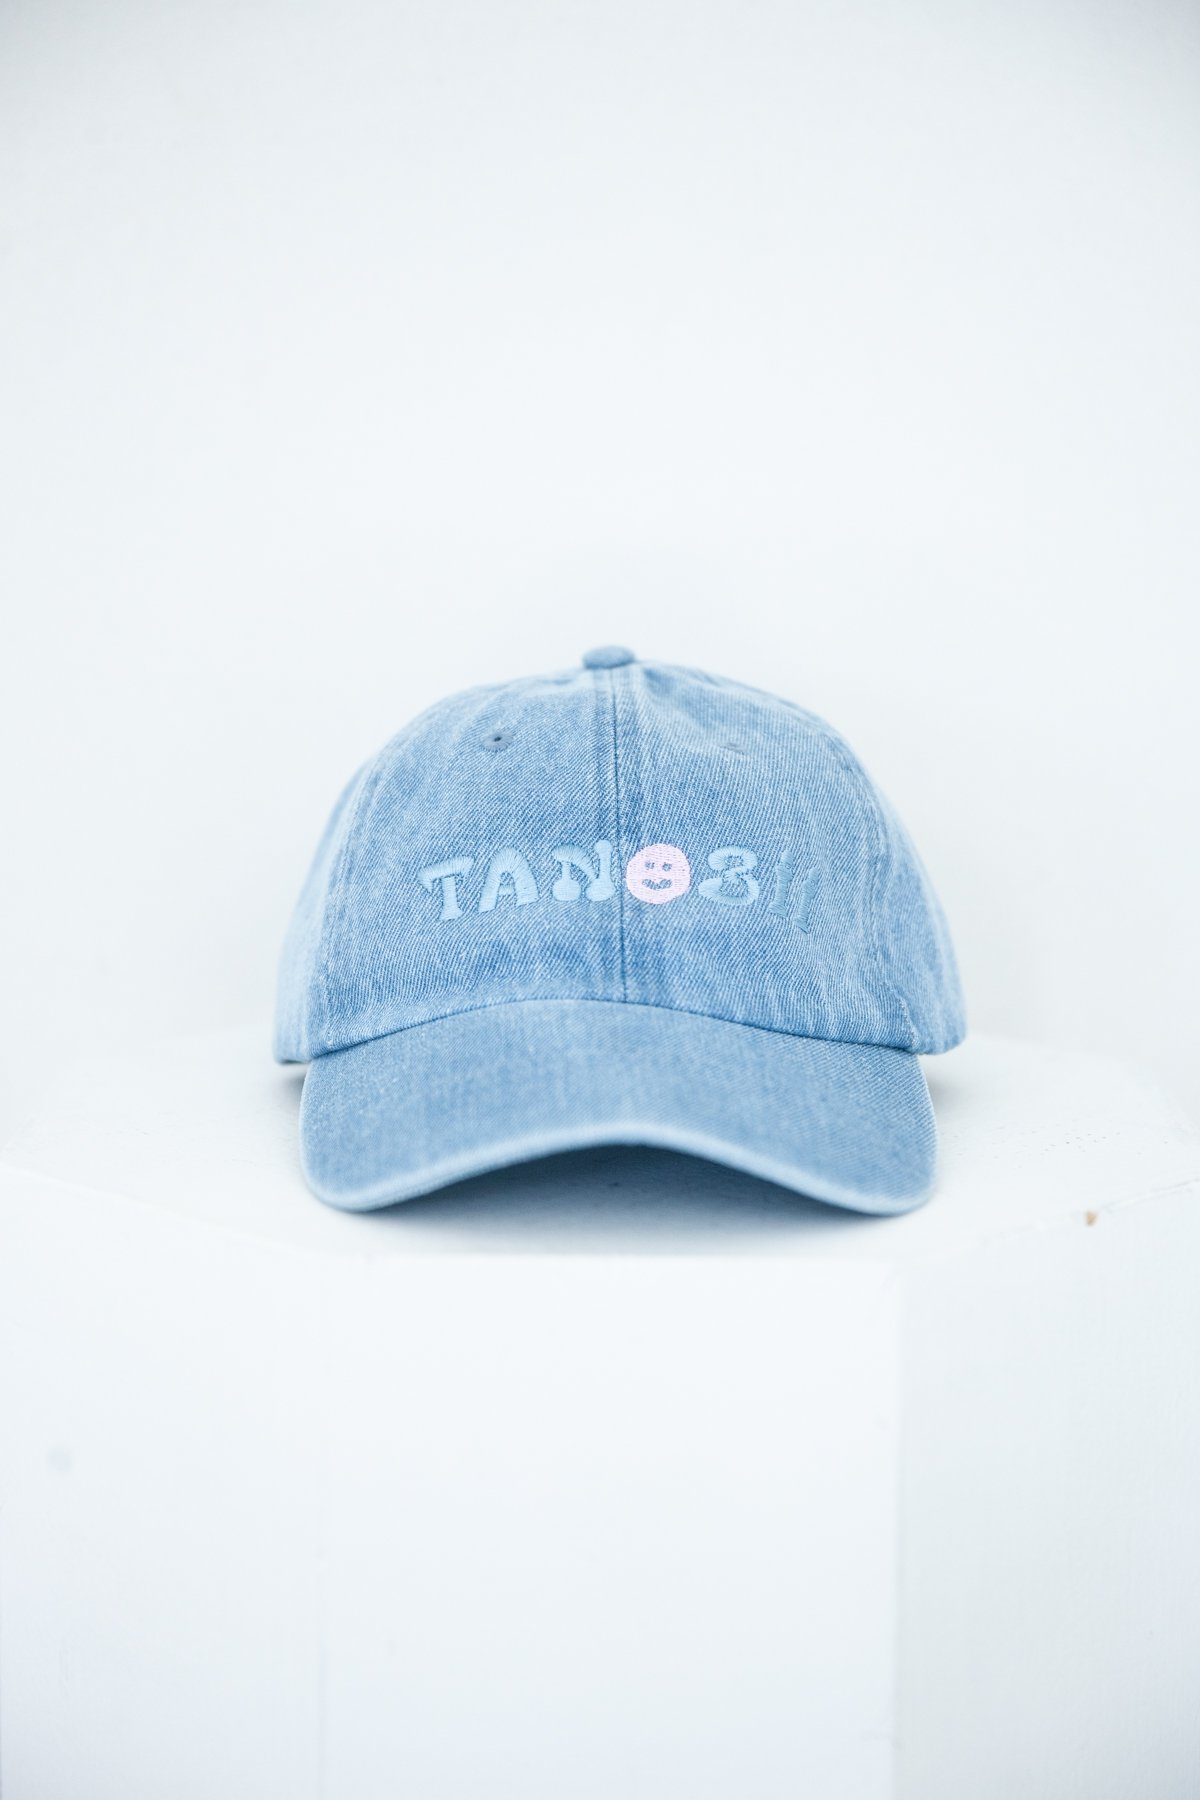 BOKU MO TANOSII × TOYAMEG / CAP BLUE